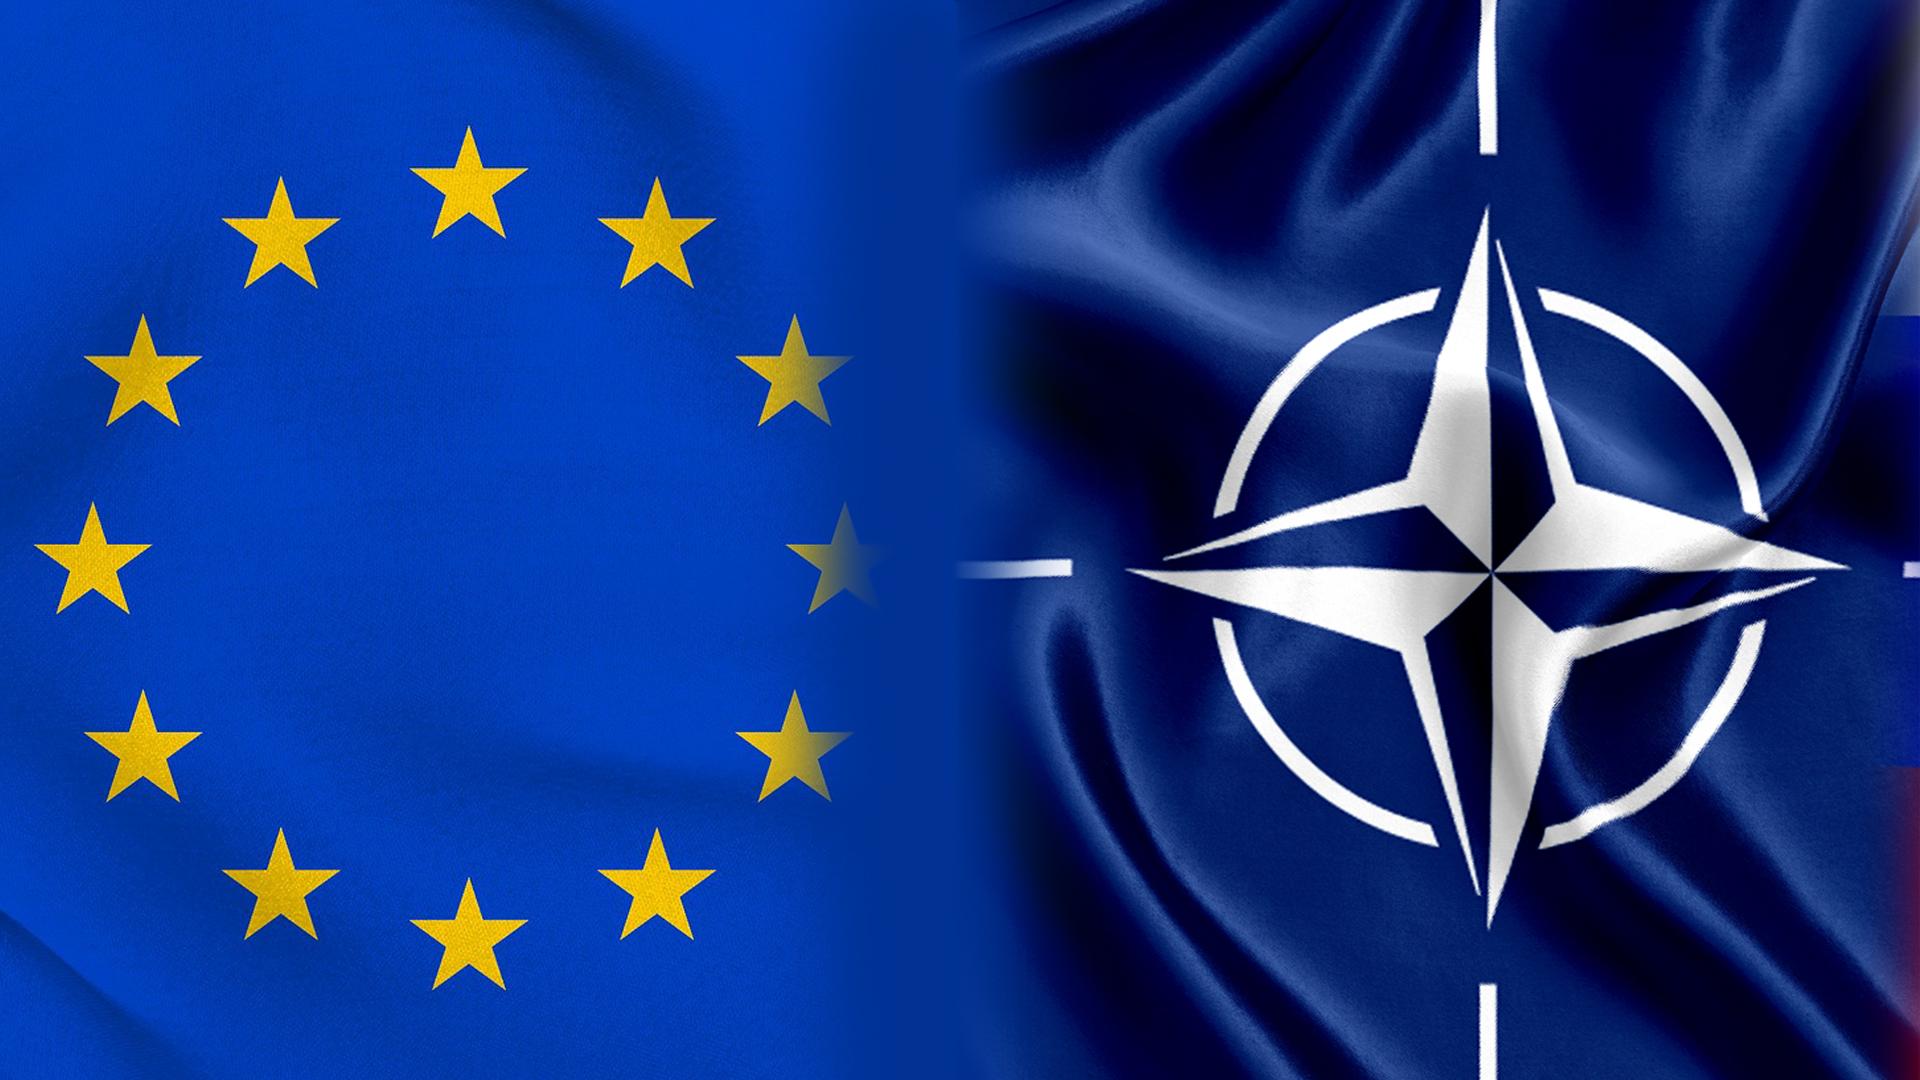 NATO & Europe post-Corona: A strategic vision for the future of regional security organizations